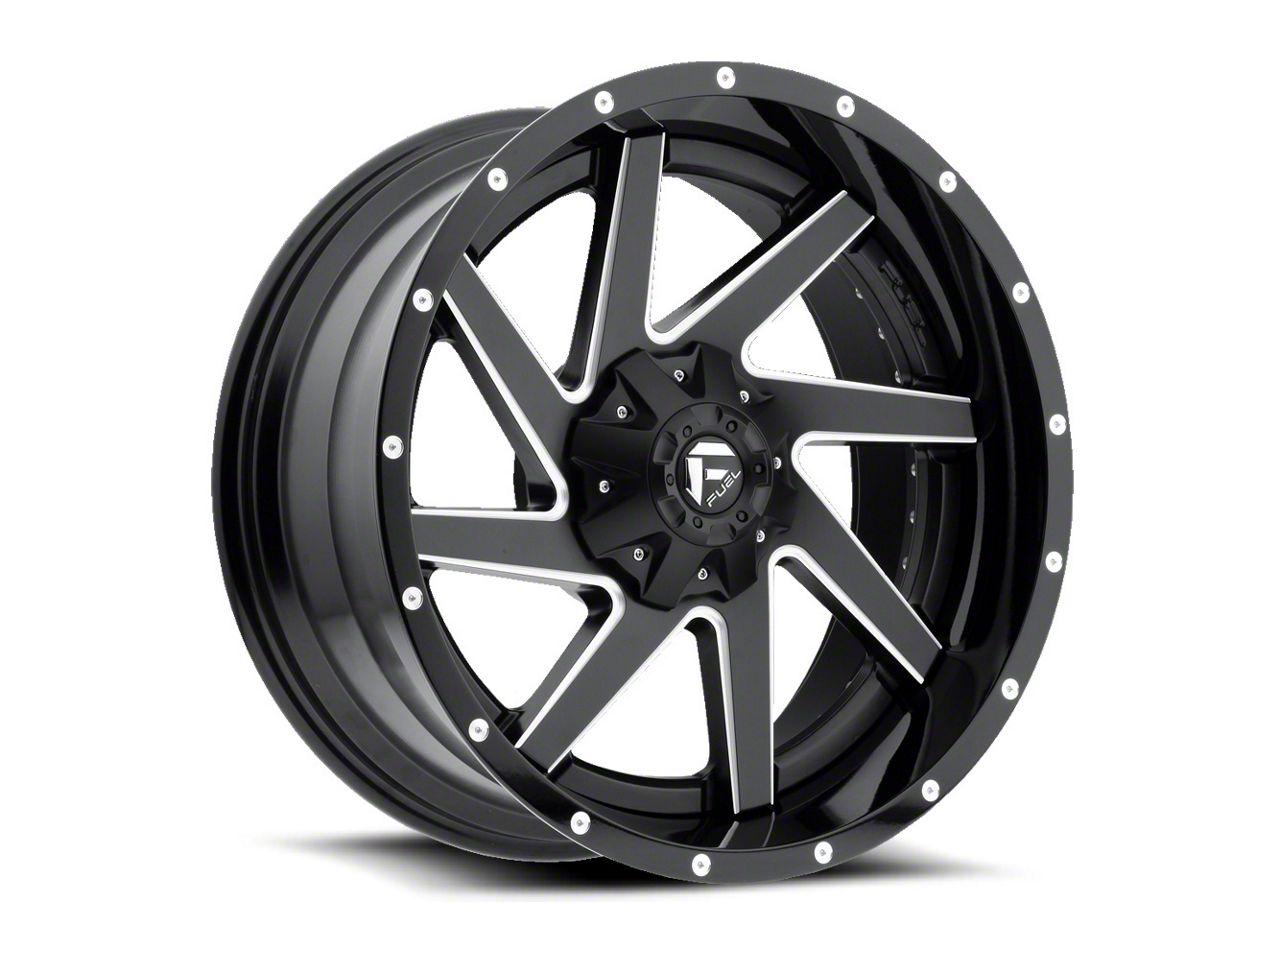 Fuel Wheels Renegade Black Milled 6-Lug Wheel - 20x14 (04-19 F-150)